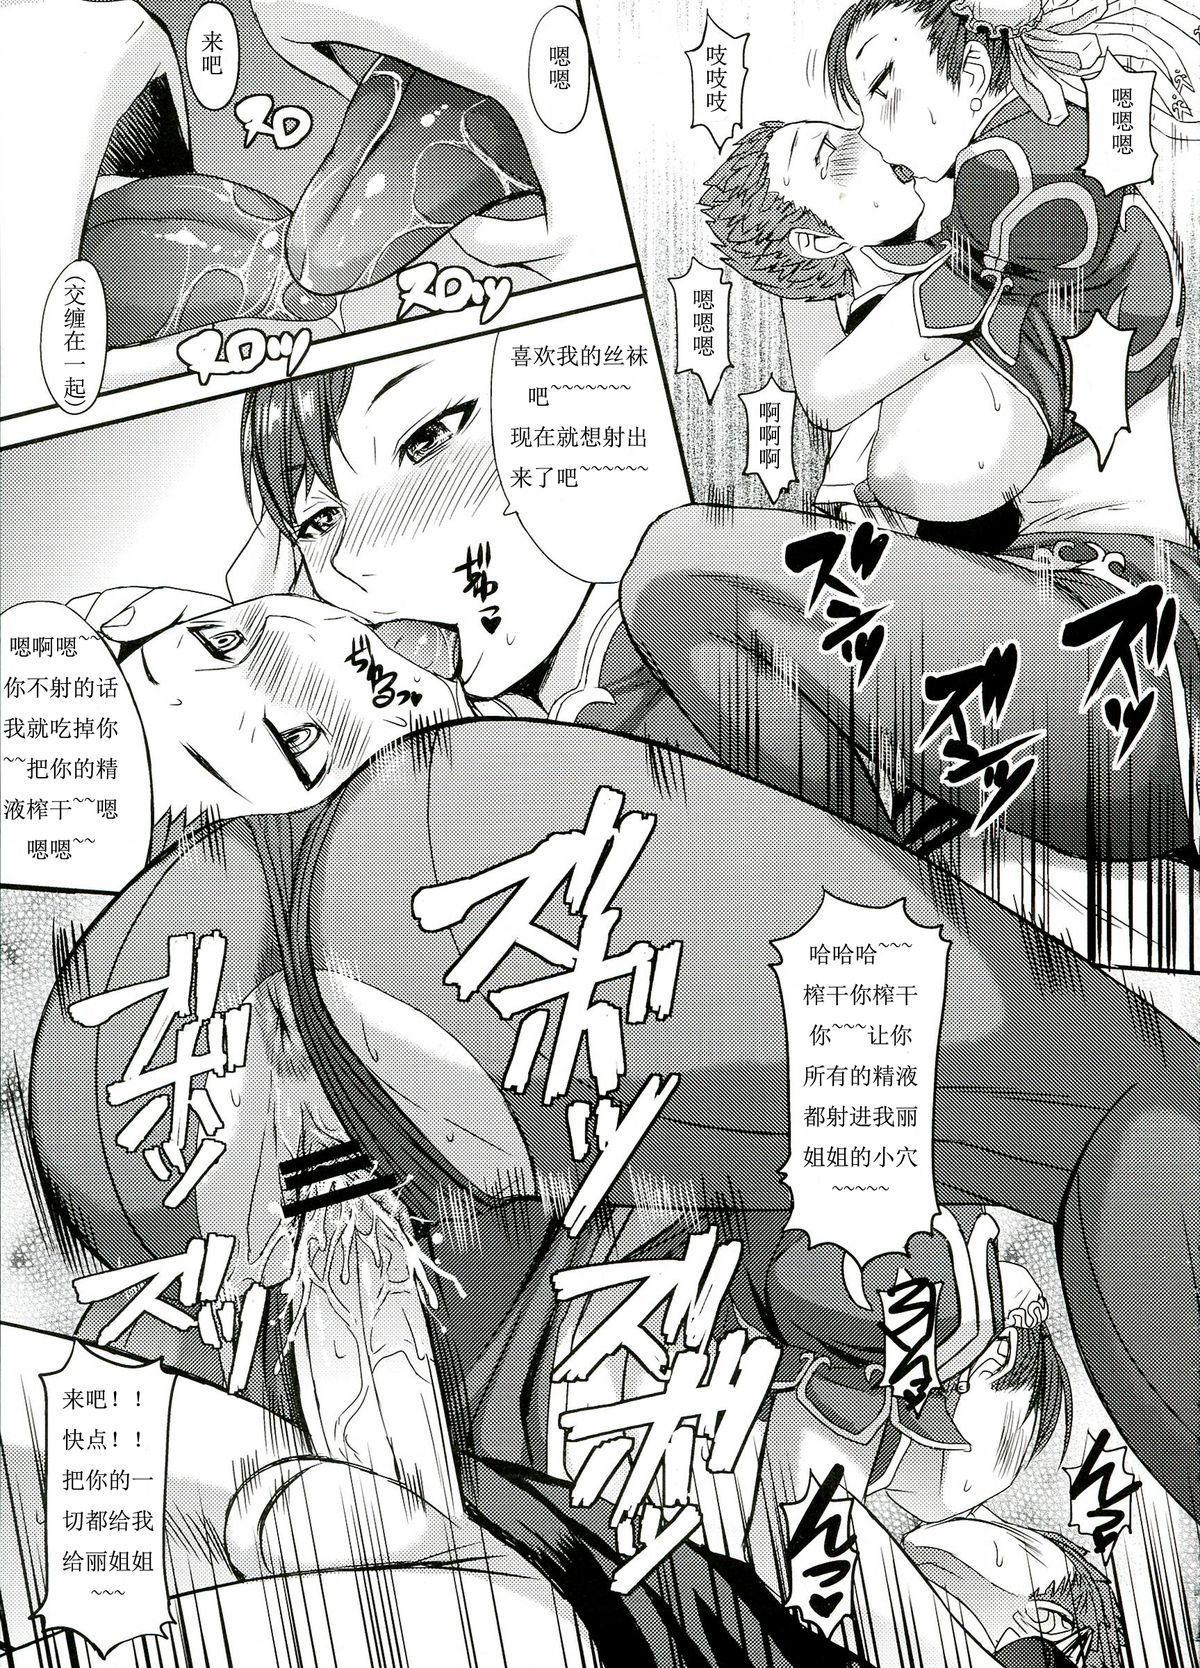 S-chun 18